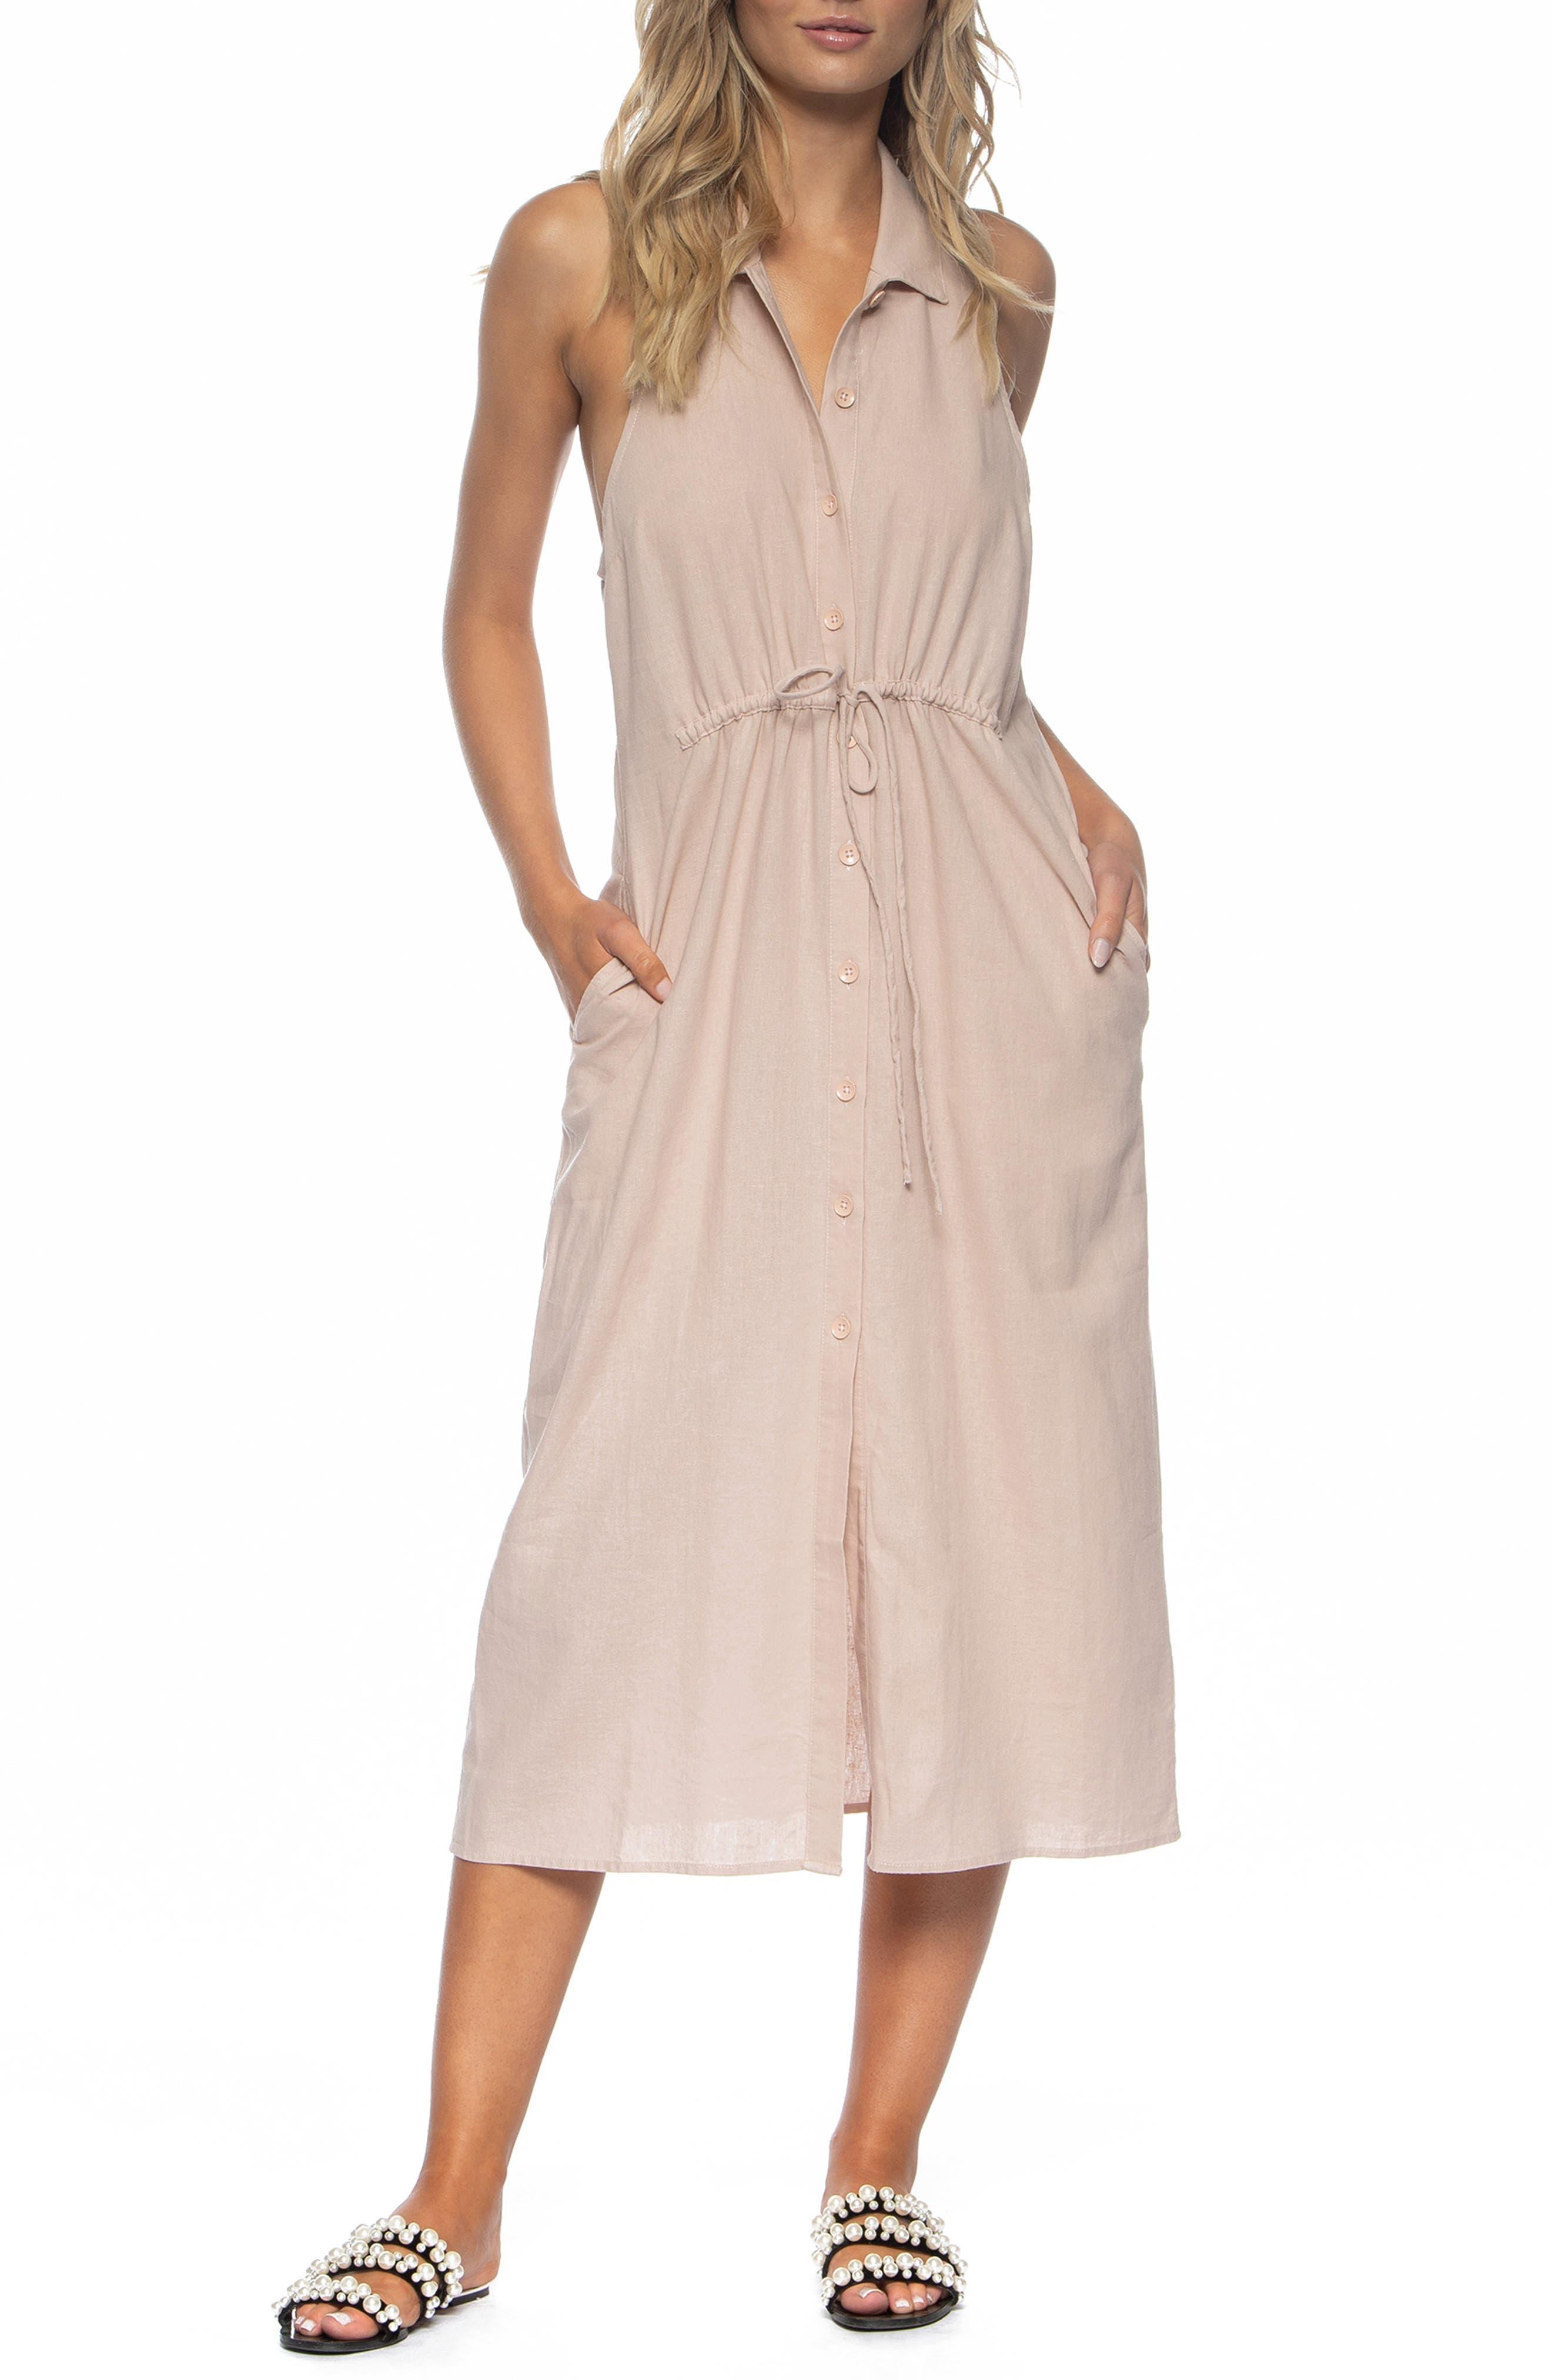 TAVIK, Maggie Cover-Up Midi Dress, Main thumbnail 1, color, SEASHELL